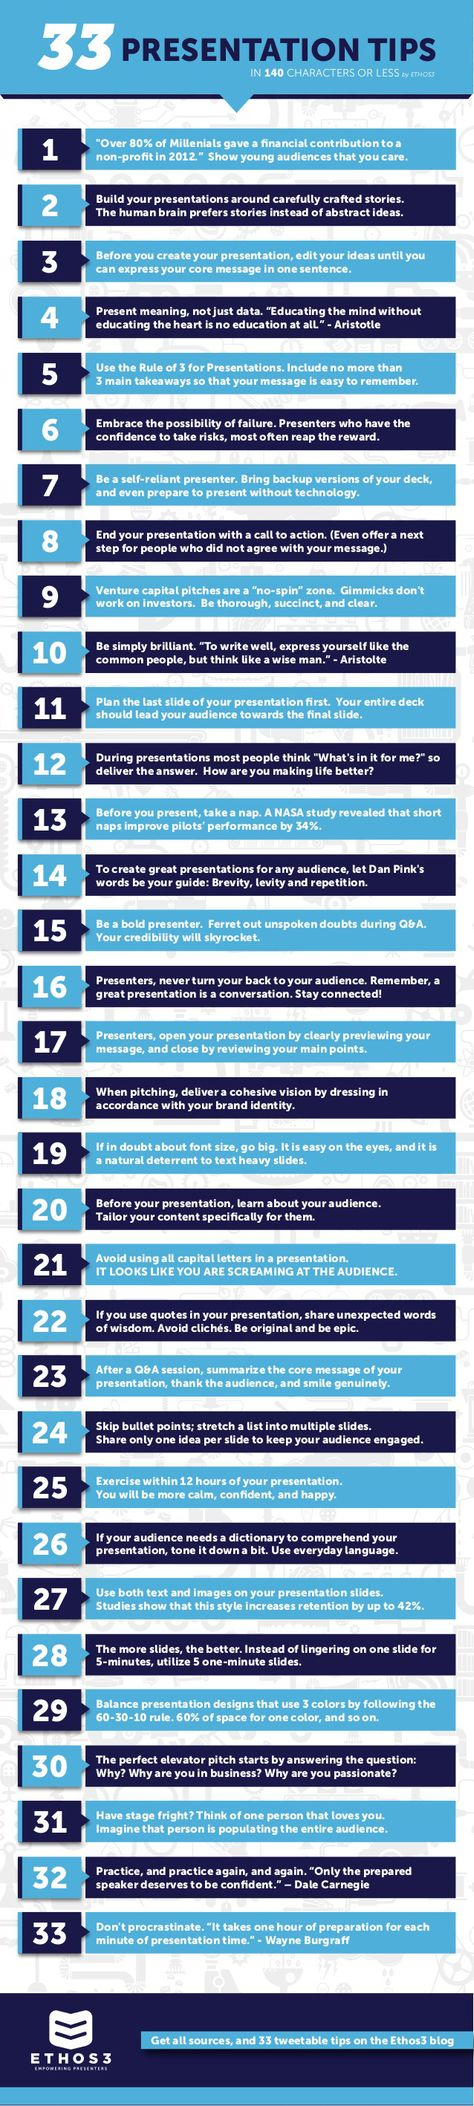 33 Presentation Tips